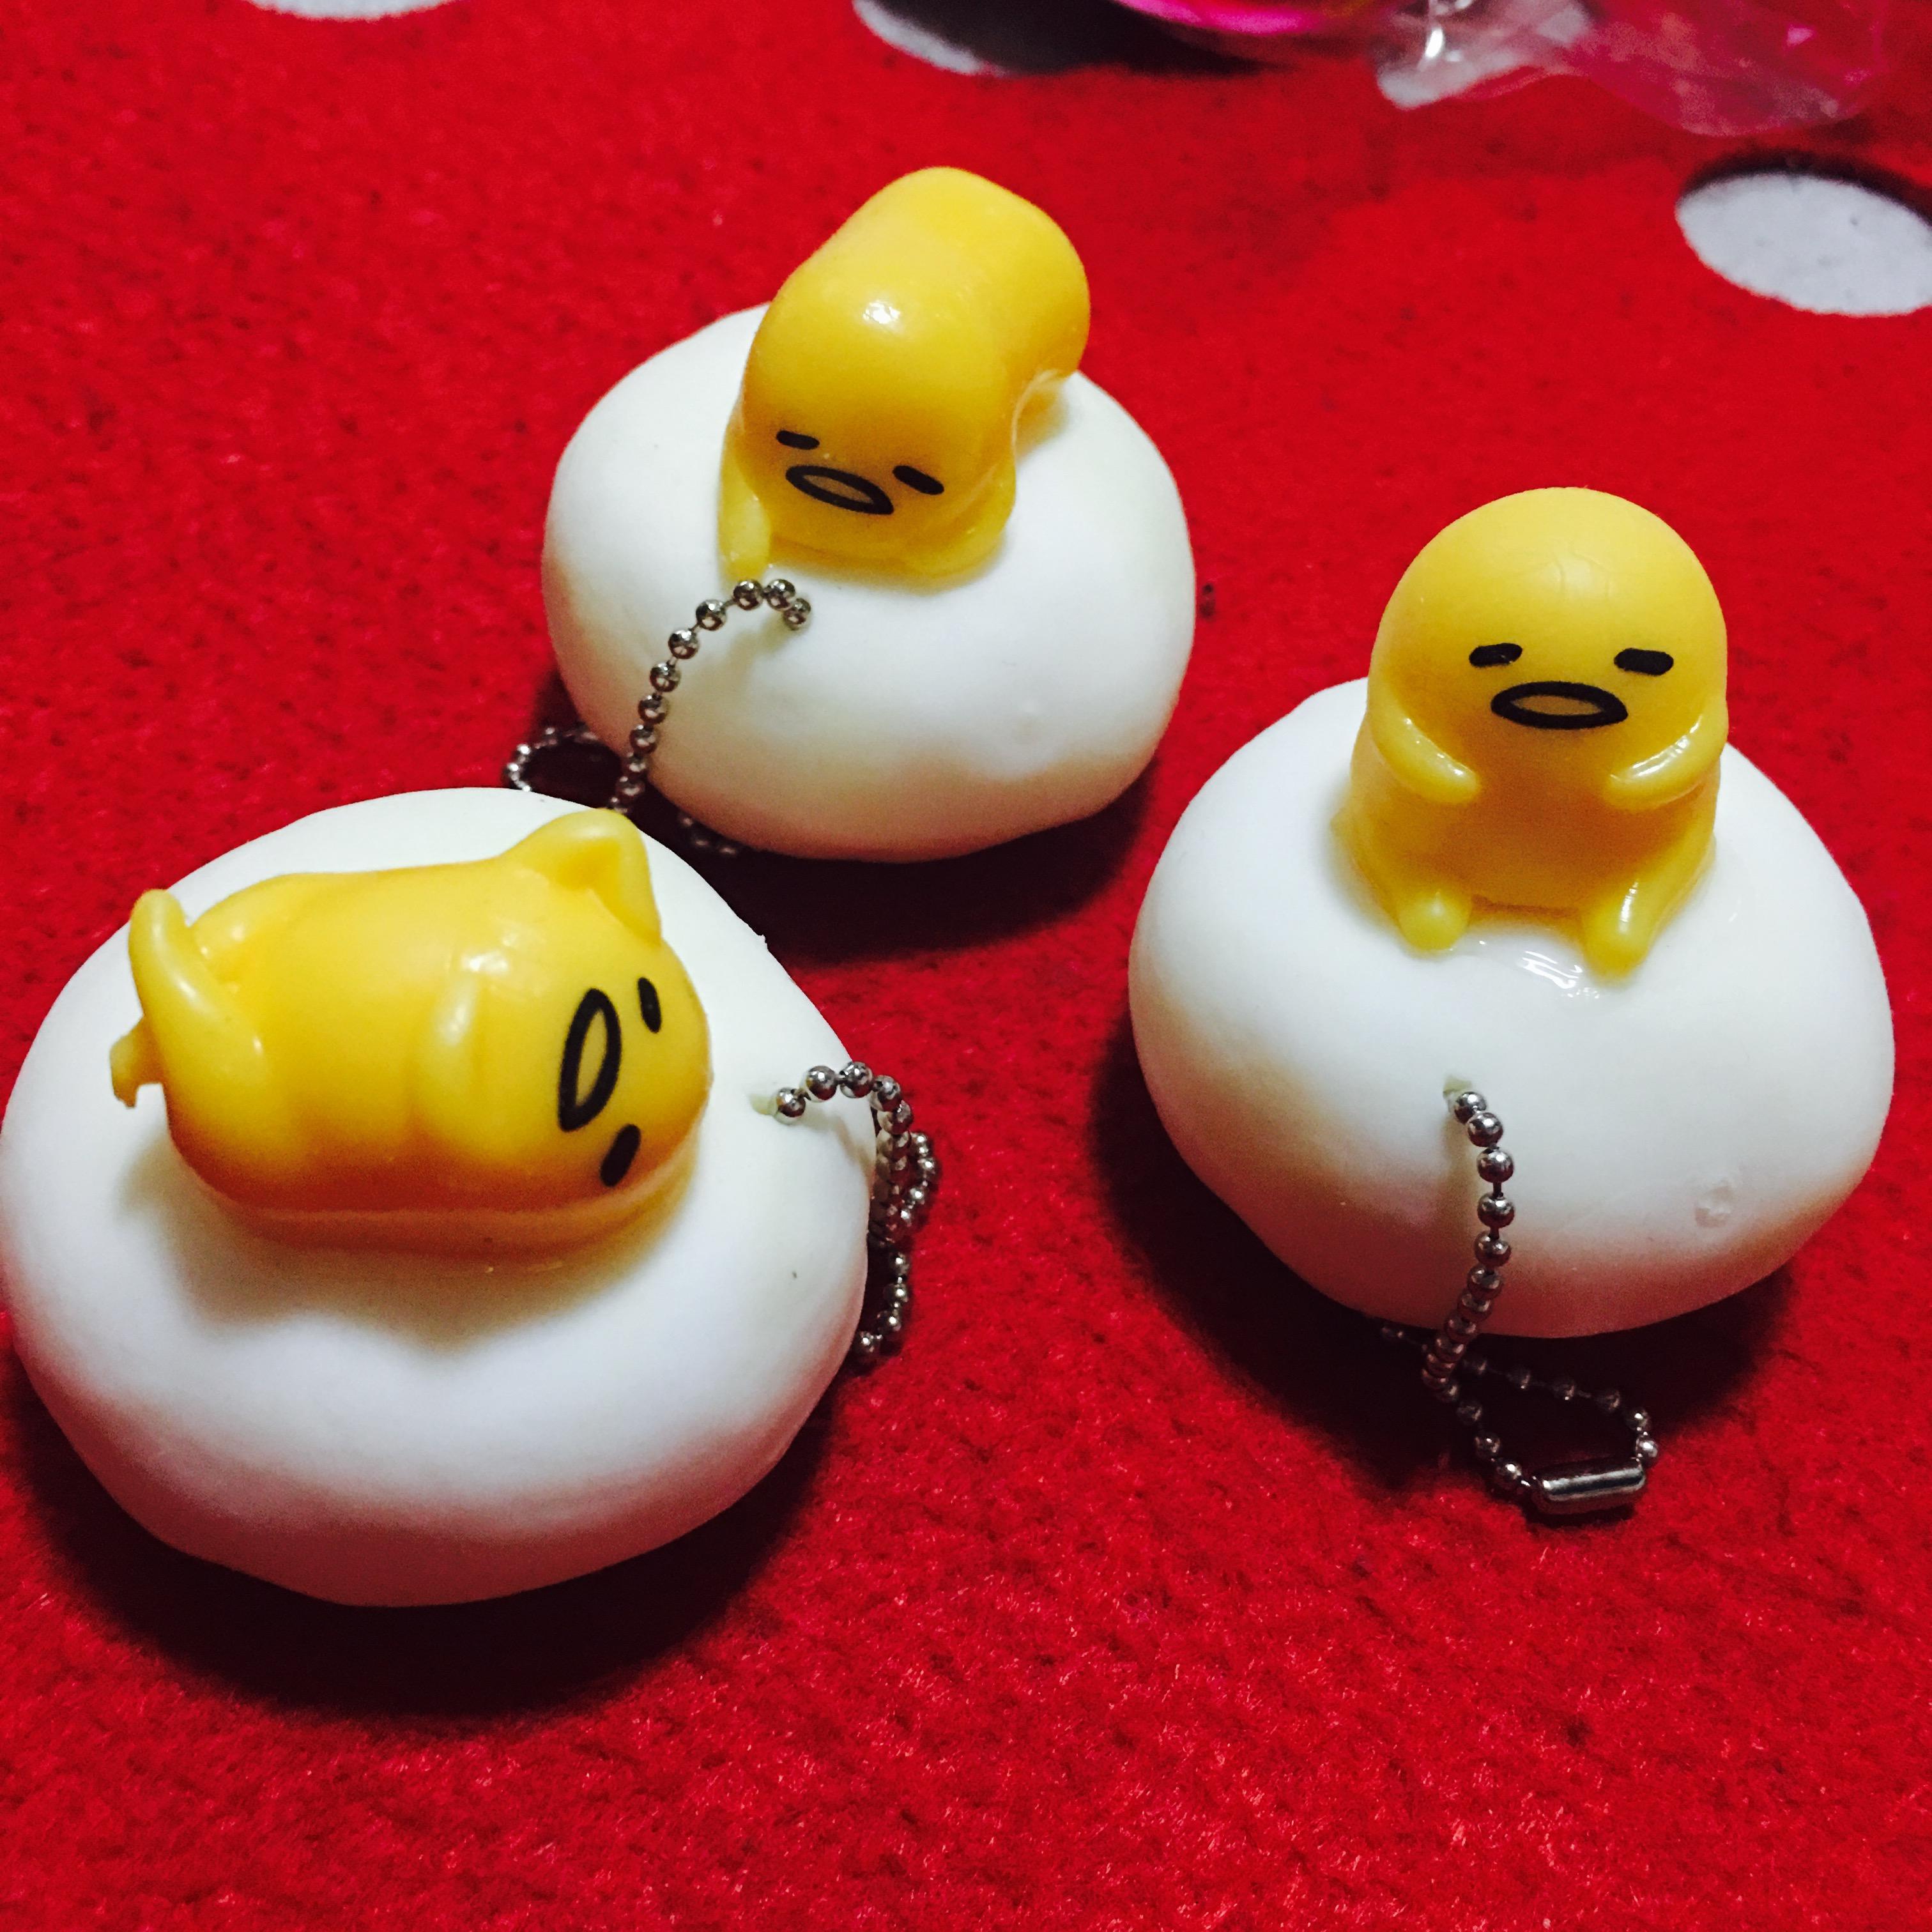 Squishy Muffinz Merch : Realistic Gudetama Mochi Squishy/Squeeze Toy on Storenvy